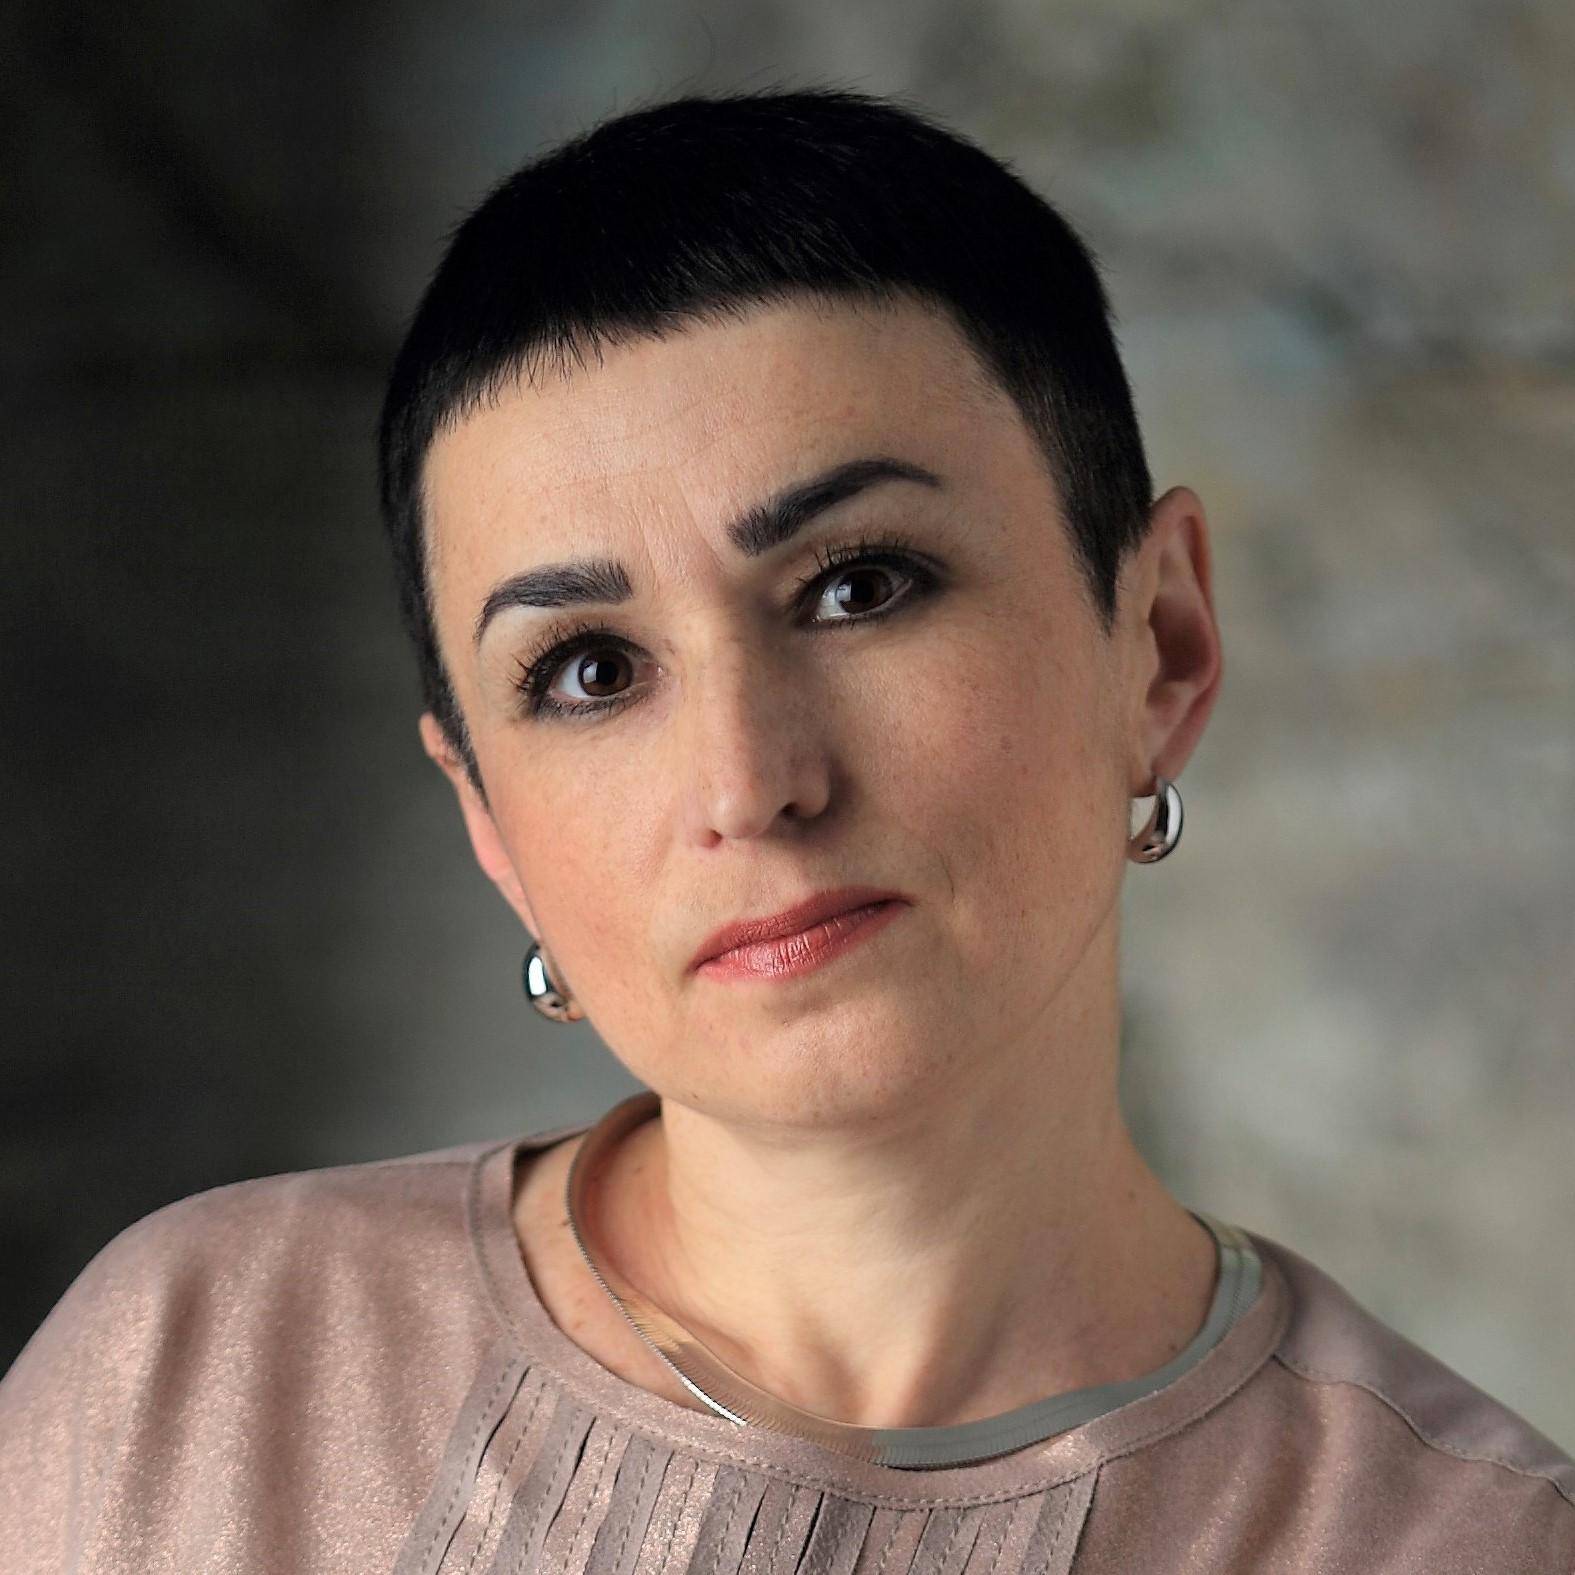 Галина Николаевна Ширяева